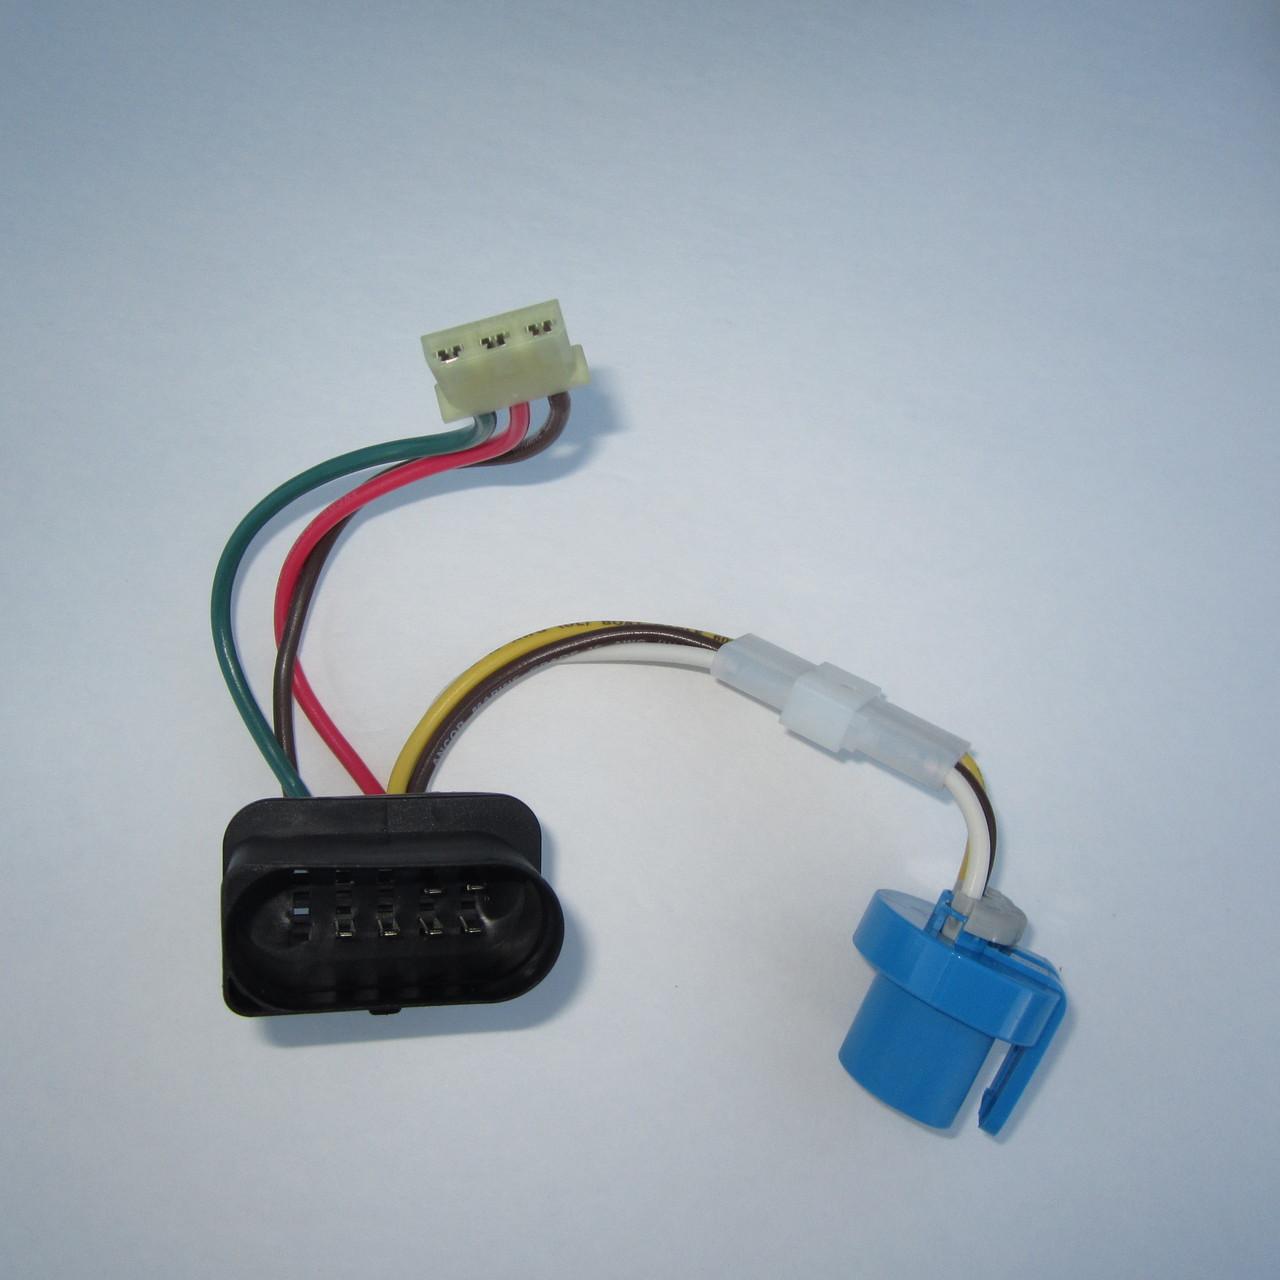 Upgraded Headlight Wiring Harness | VW MK4 Jetta | 2 Pack